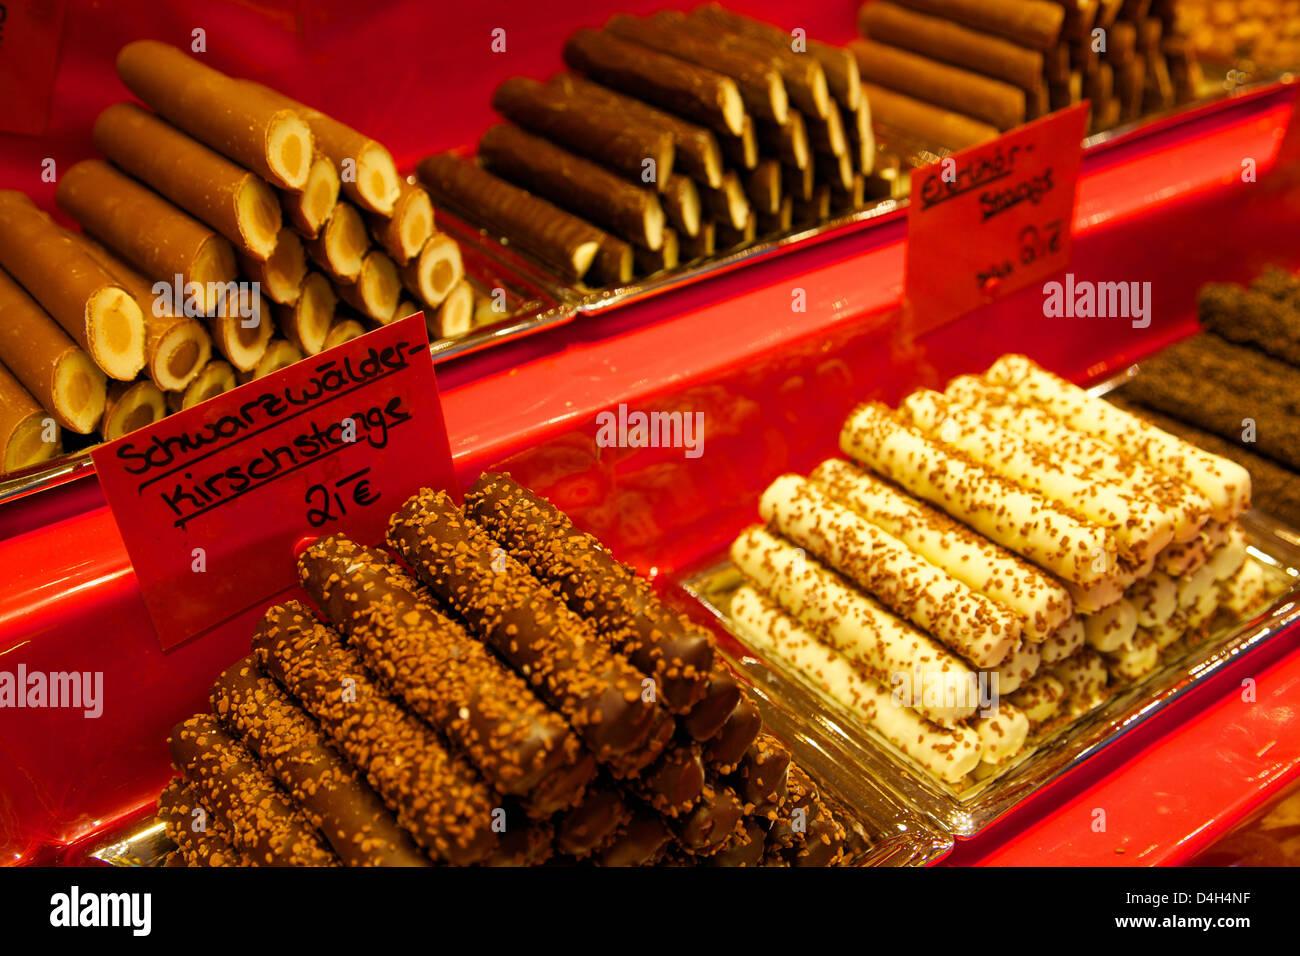 Chocolate stall at the Christmas Market, Dortmund, North Rhine-Westphalia, Germany Stock Photo